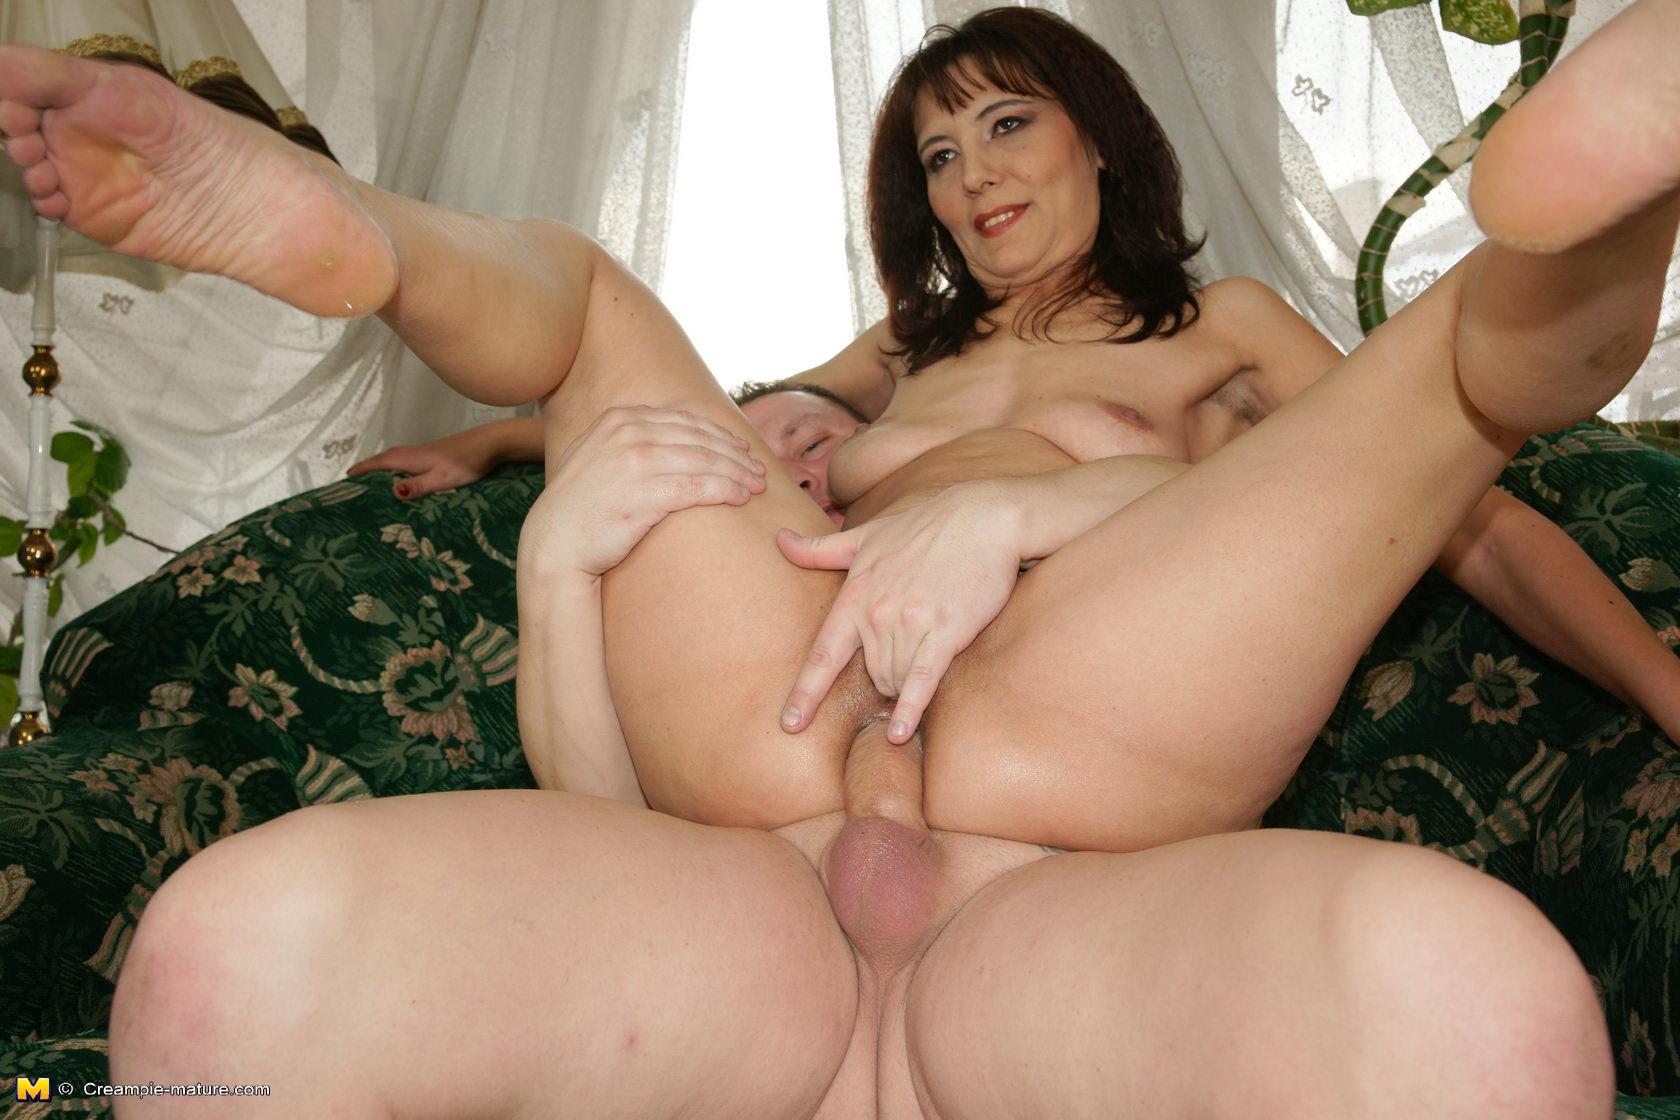 Nice culos and boobs